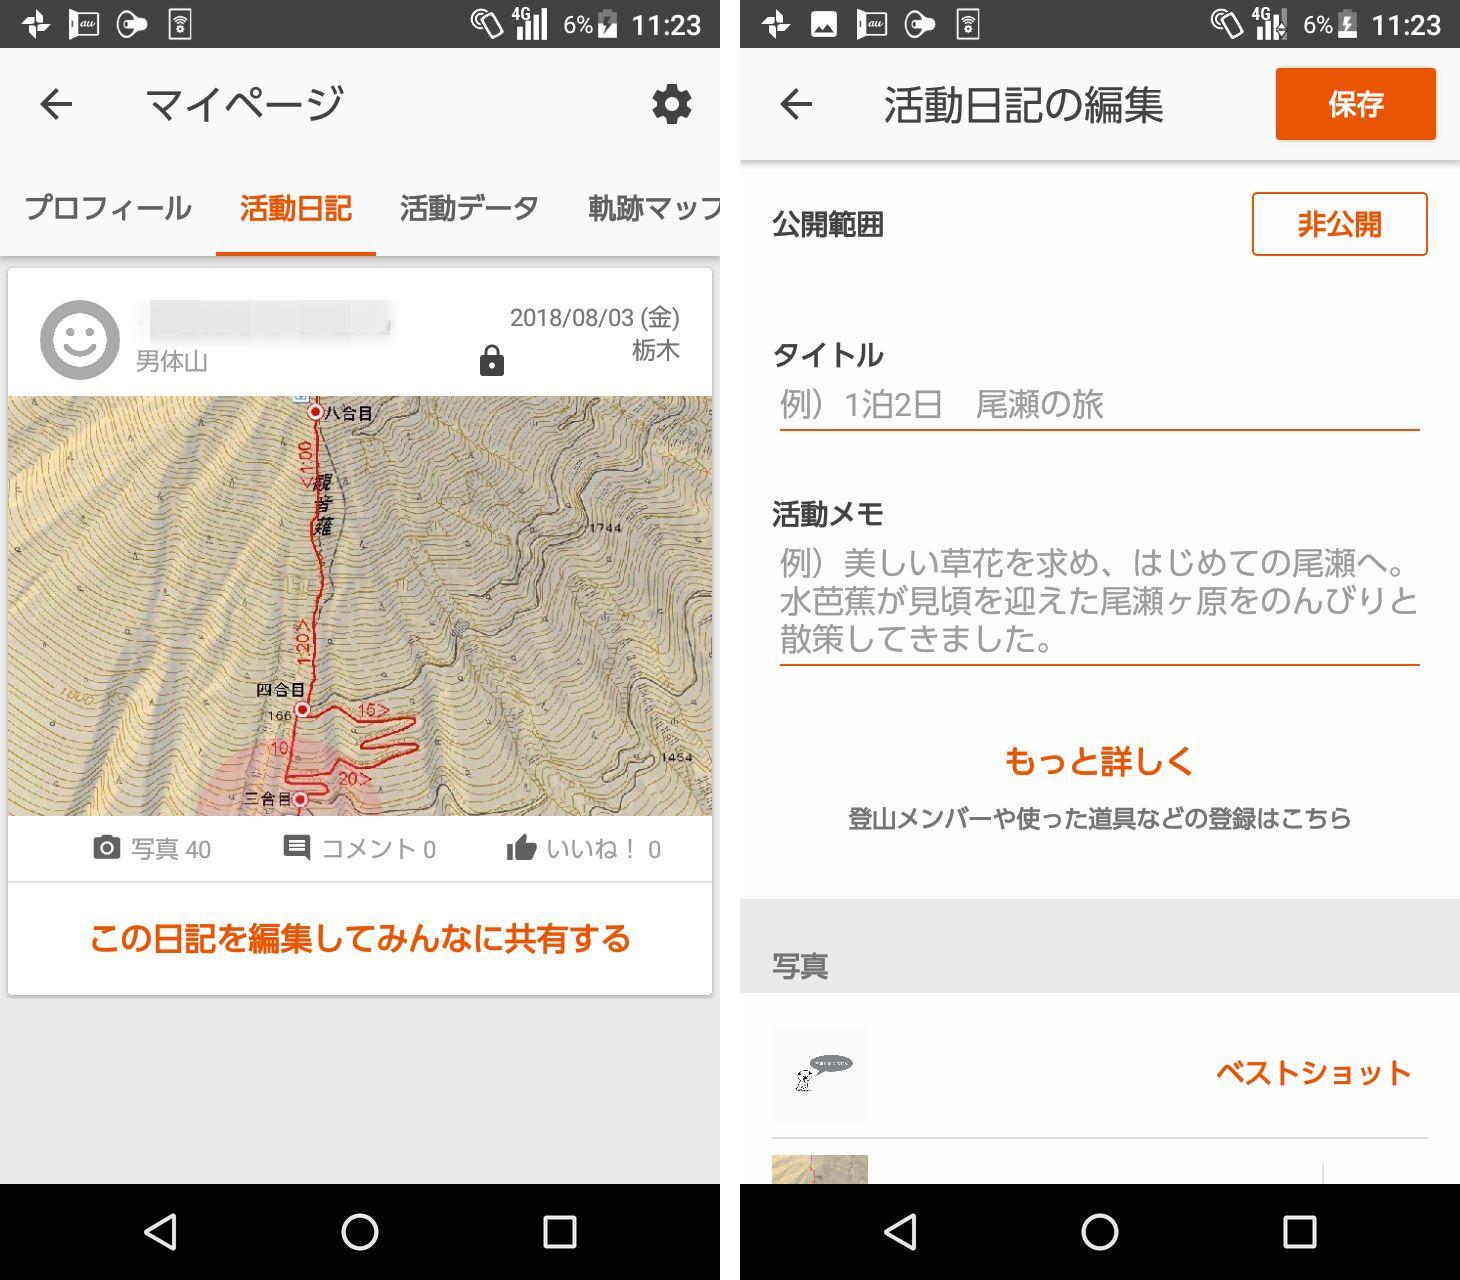 YAMAP活動日記画面